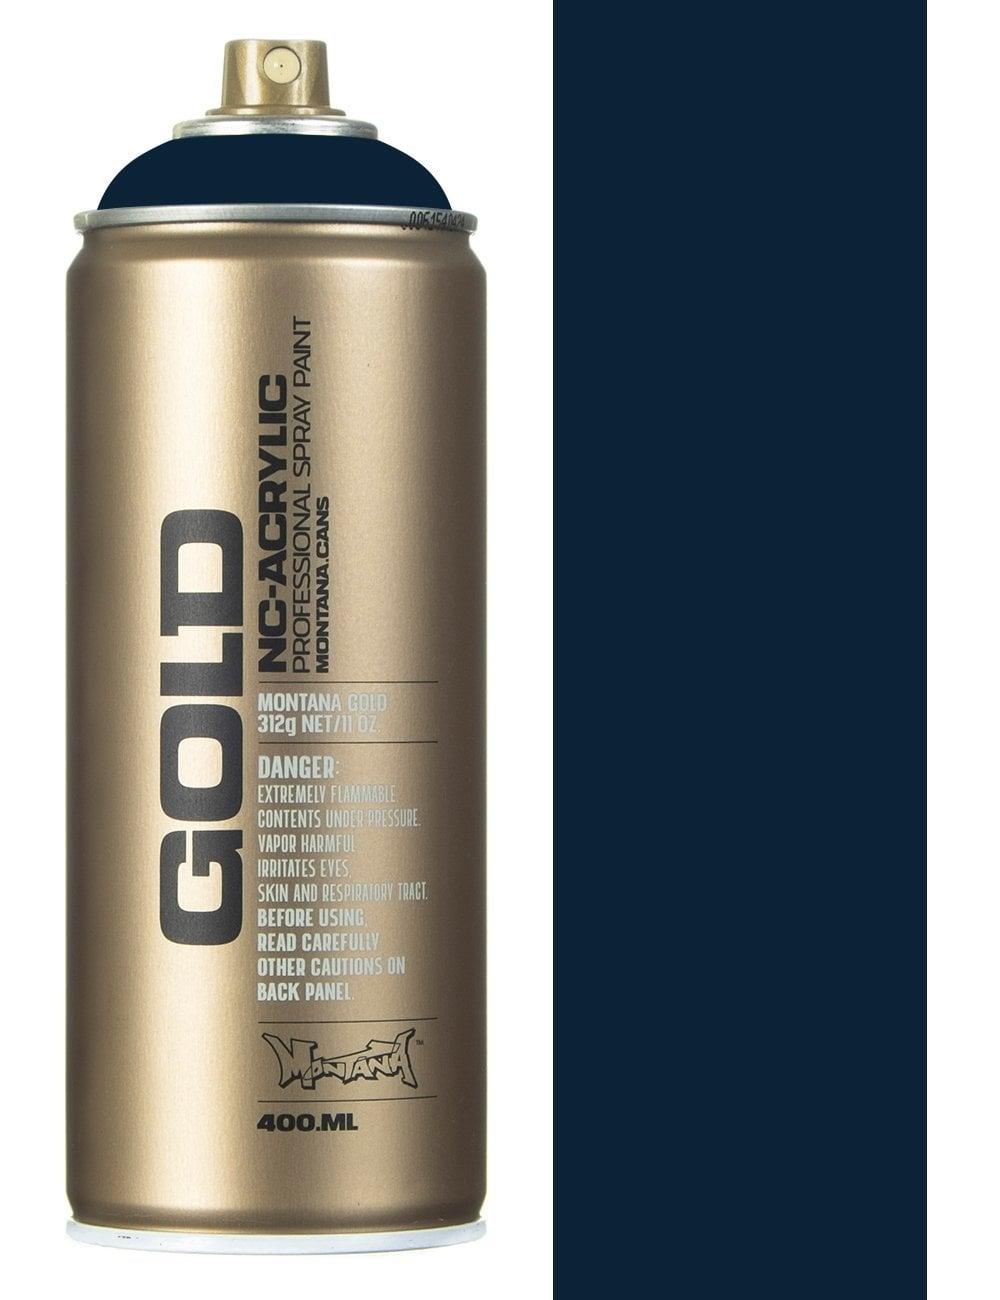 Montana Gold Nautilus Spray Paint 400ml Spray Paint Supplies